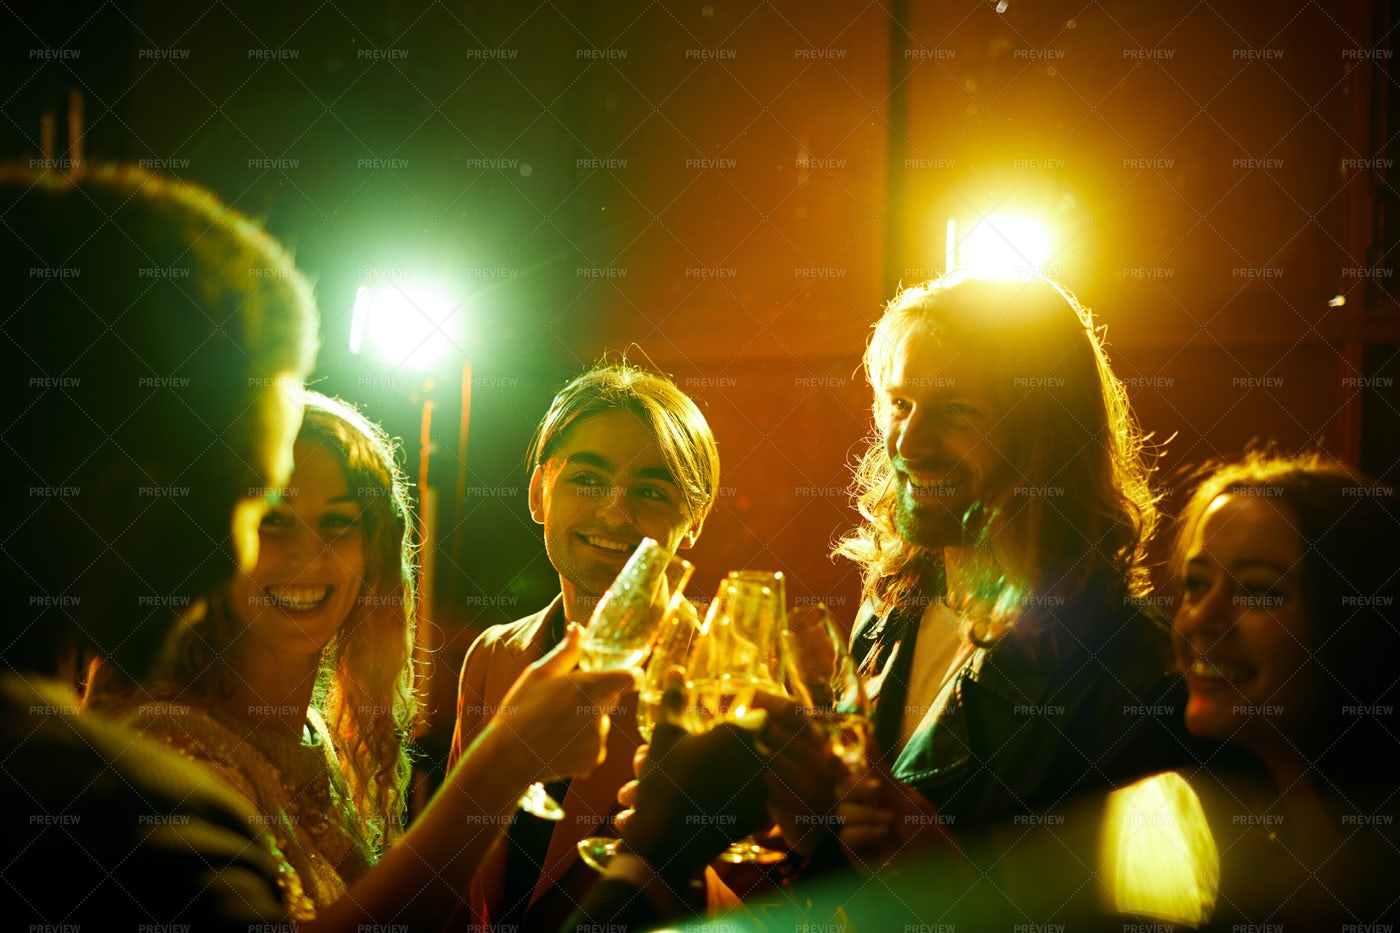 Hilarious Friends Drinking...: Stock Photos